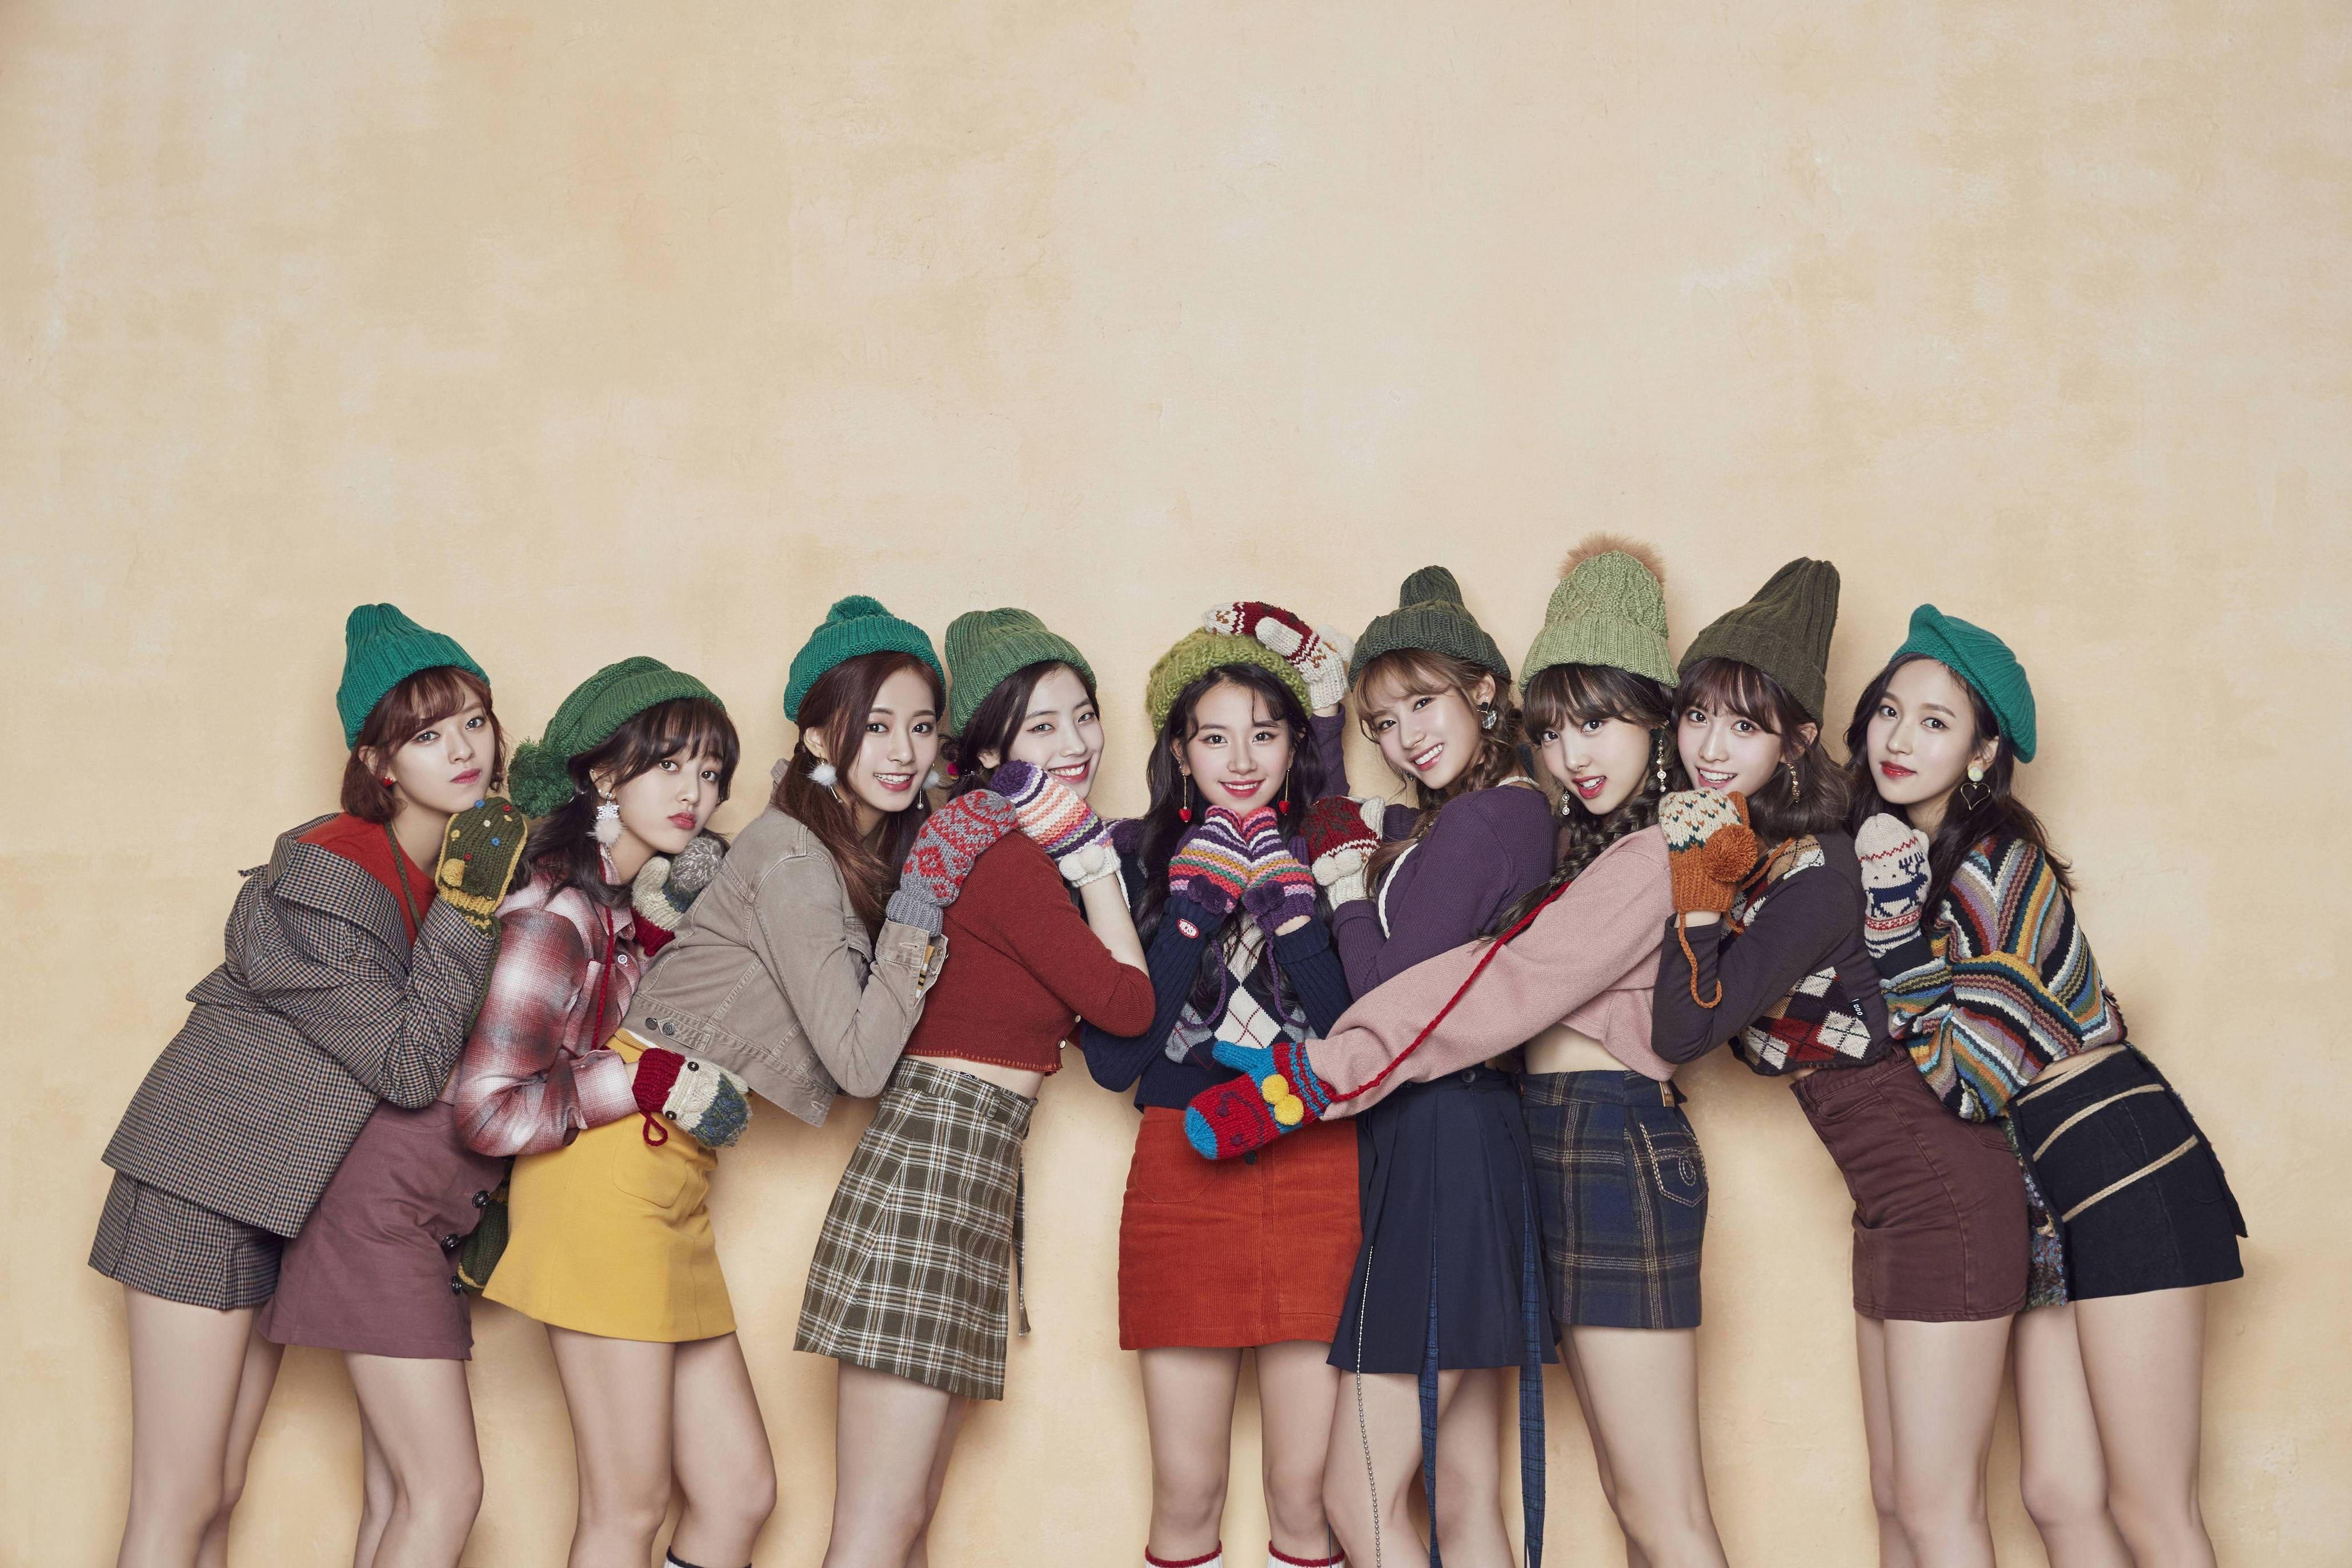 K Pop Twice Christmas Singer Women Warm Colors Asian 4k Wallpaper Hdwallpaper Desktop Merry Happy Twice South Korean Girls